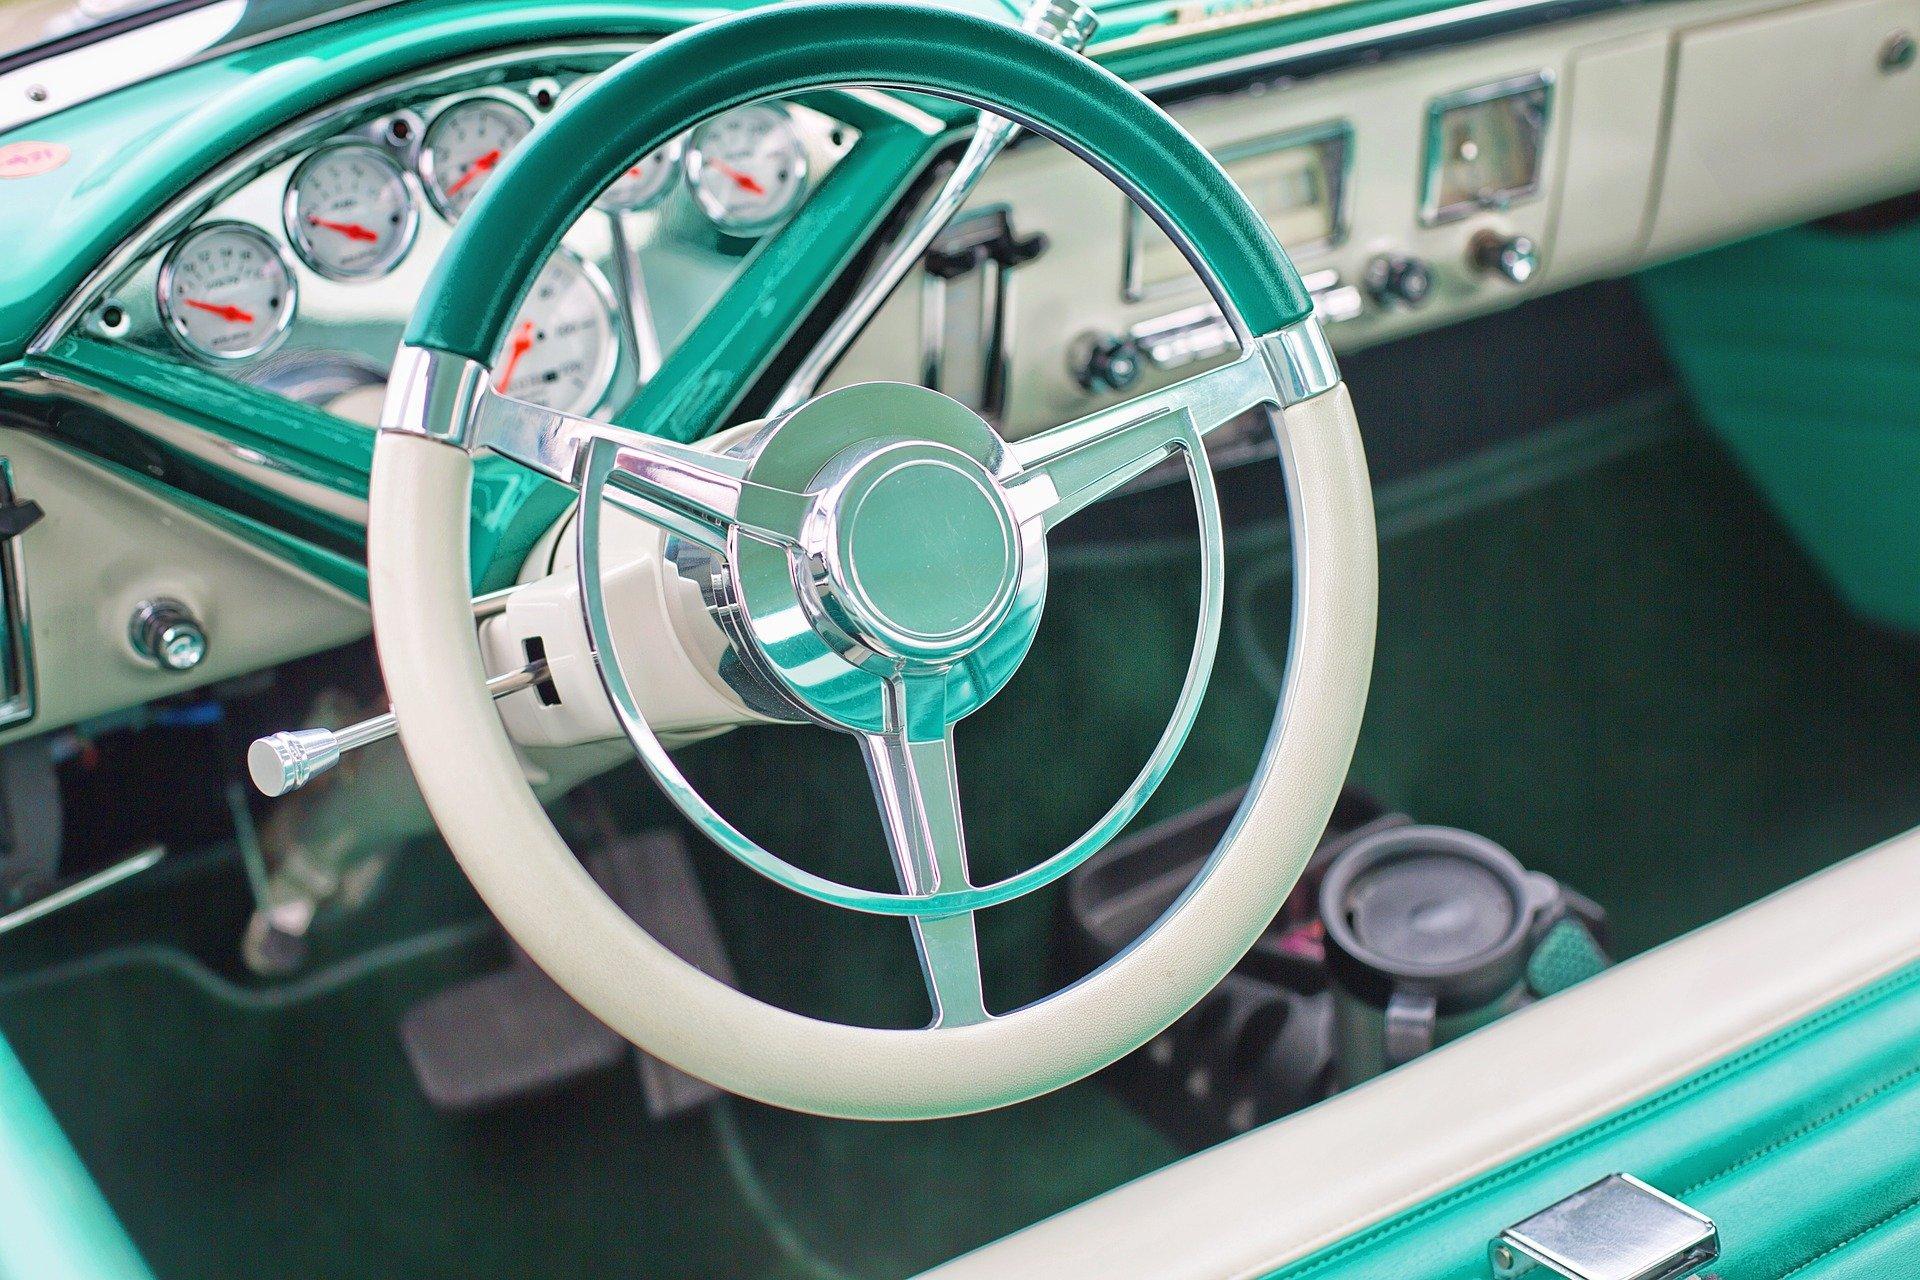 Automotive sensors Market Major challenges, Key player positioning analysis and Competitive Landscape Forecast 2021-2031